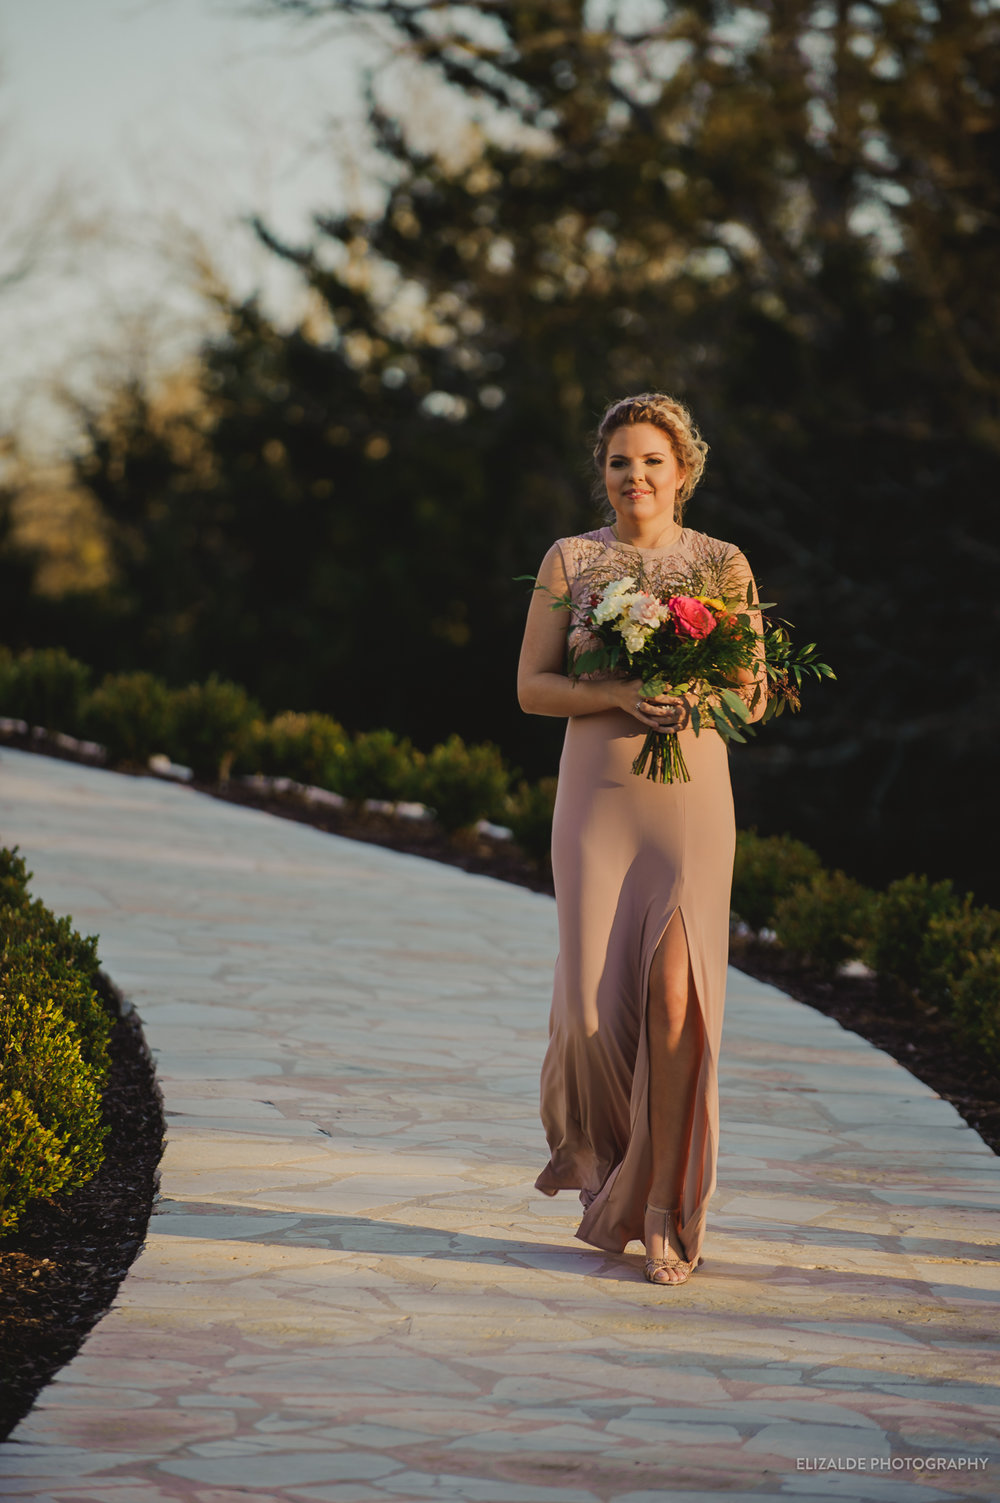 Wedding Photographer Dallas_ DFW Wedding Photographer_elizalde photography_wedding photography (82 of 220).jpg